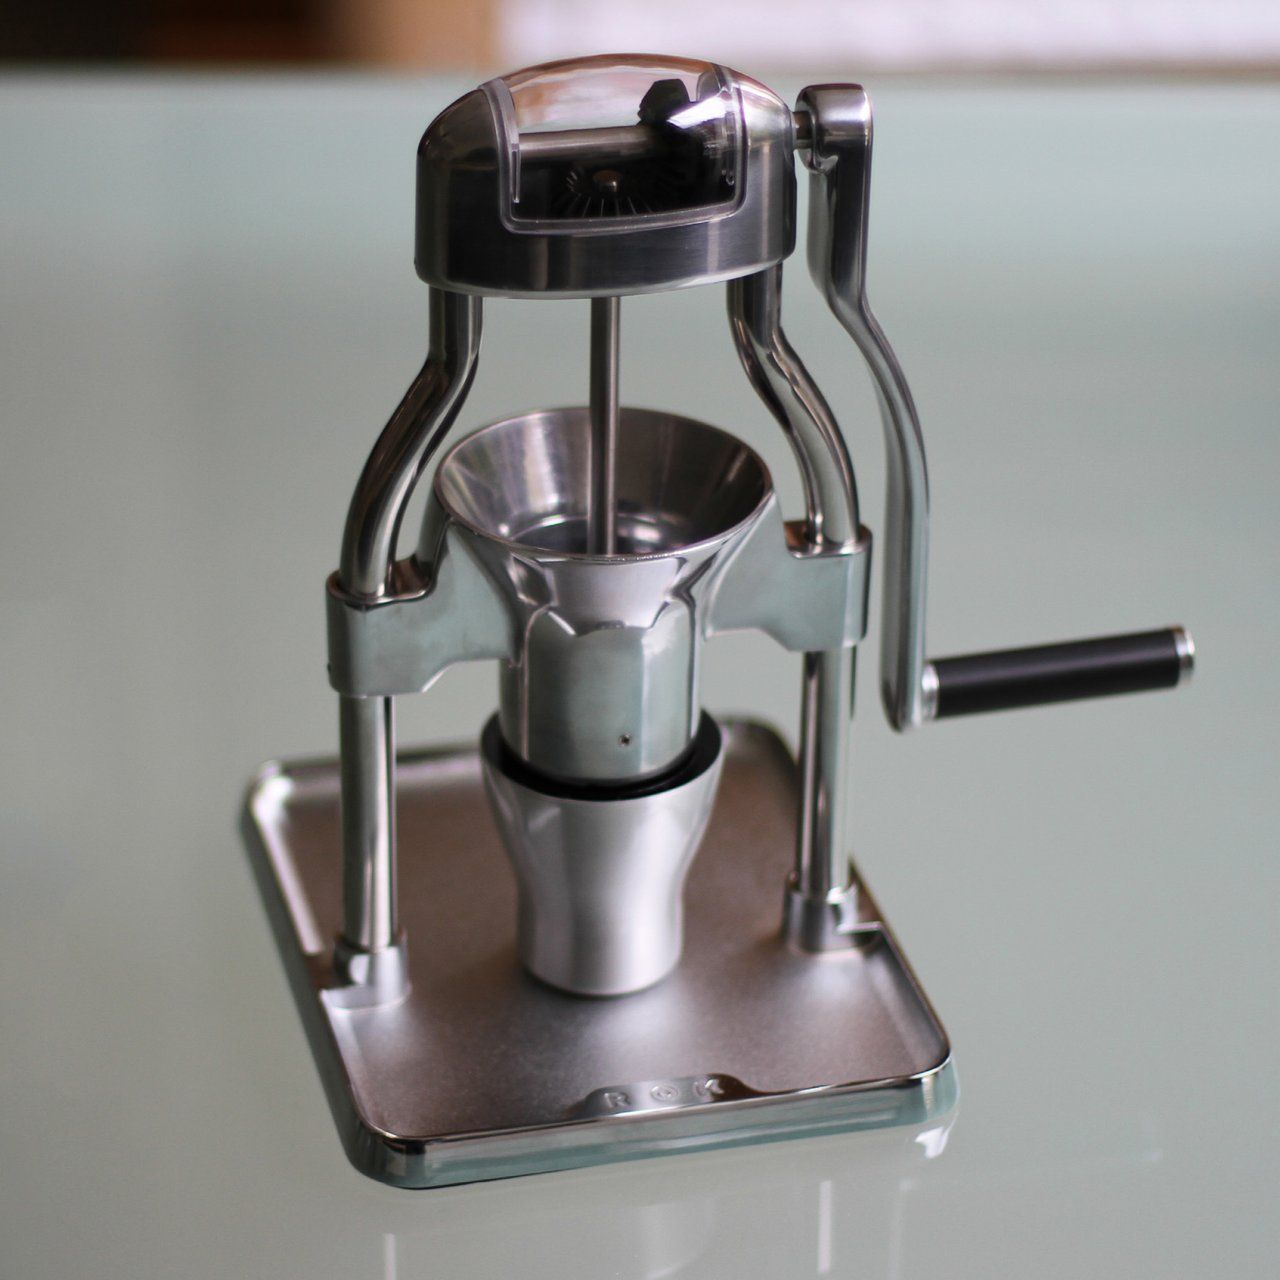 Rok Manual Coffee Grinder (With images) Espresso grinder